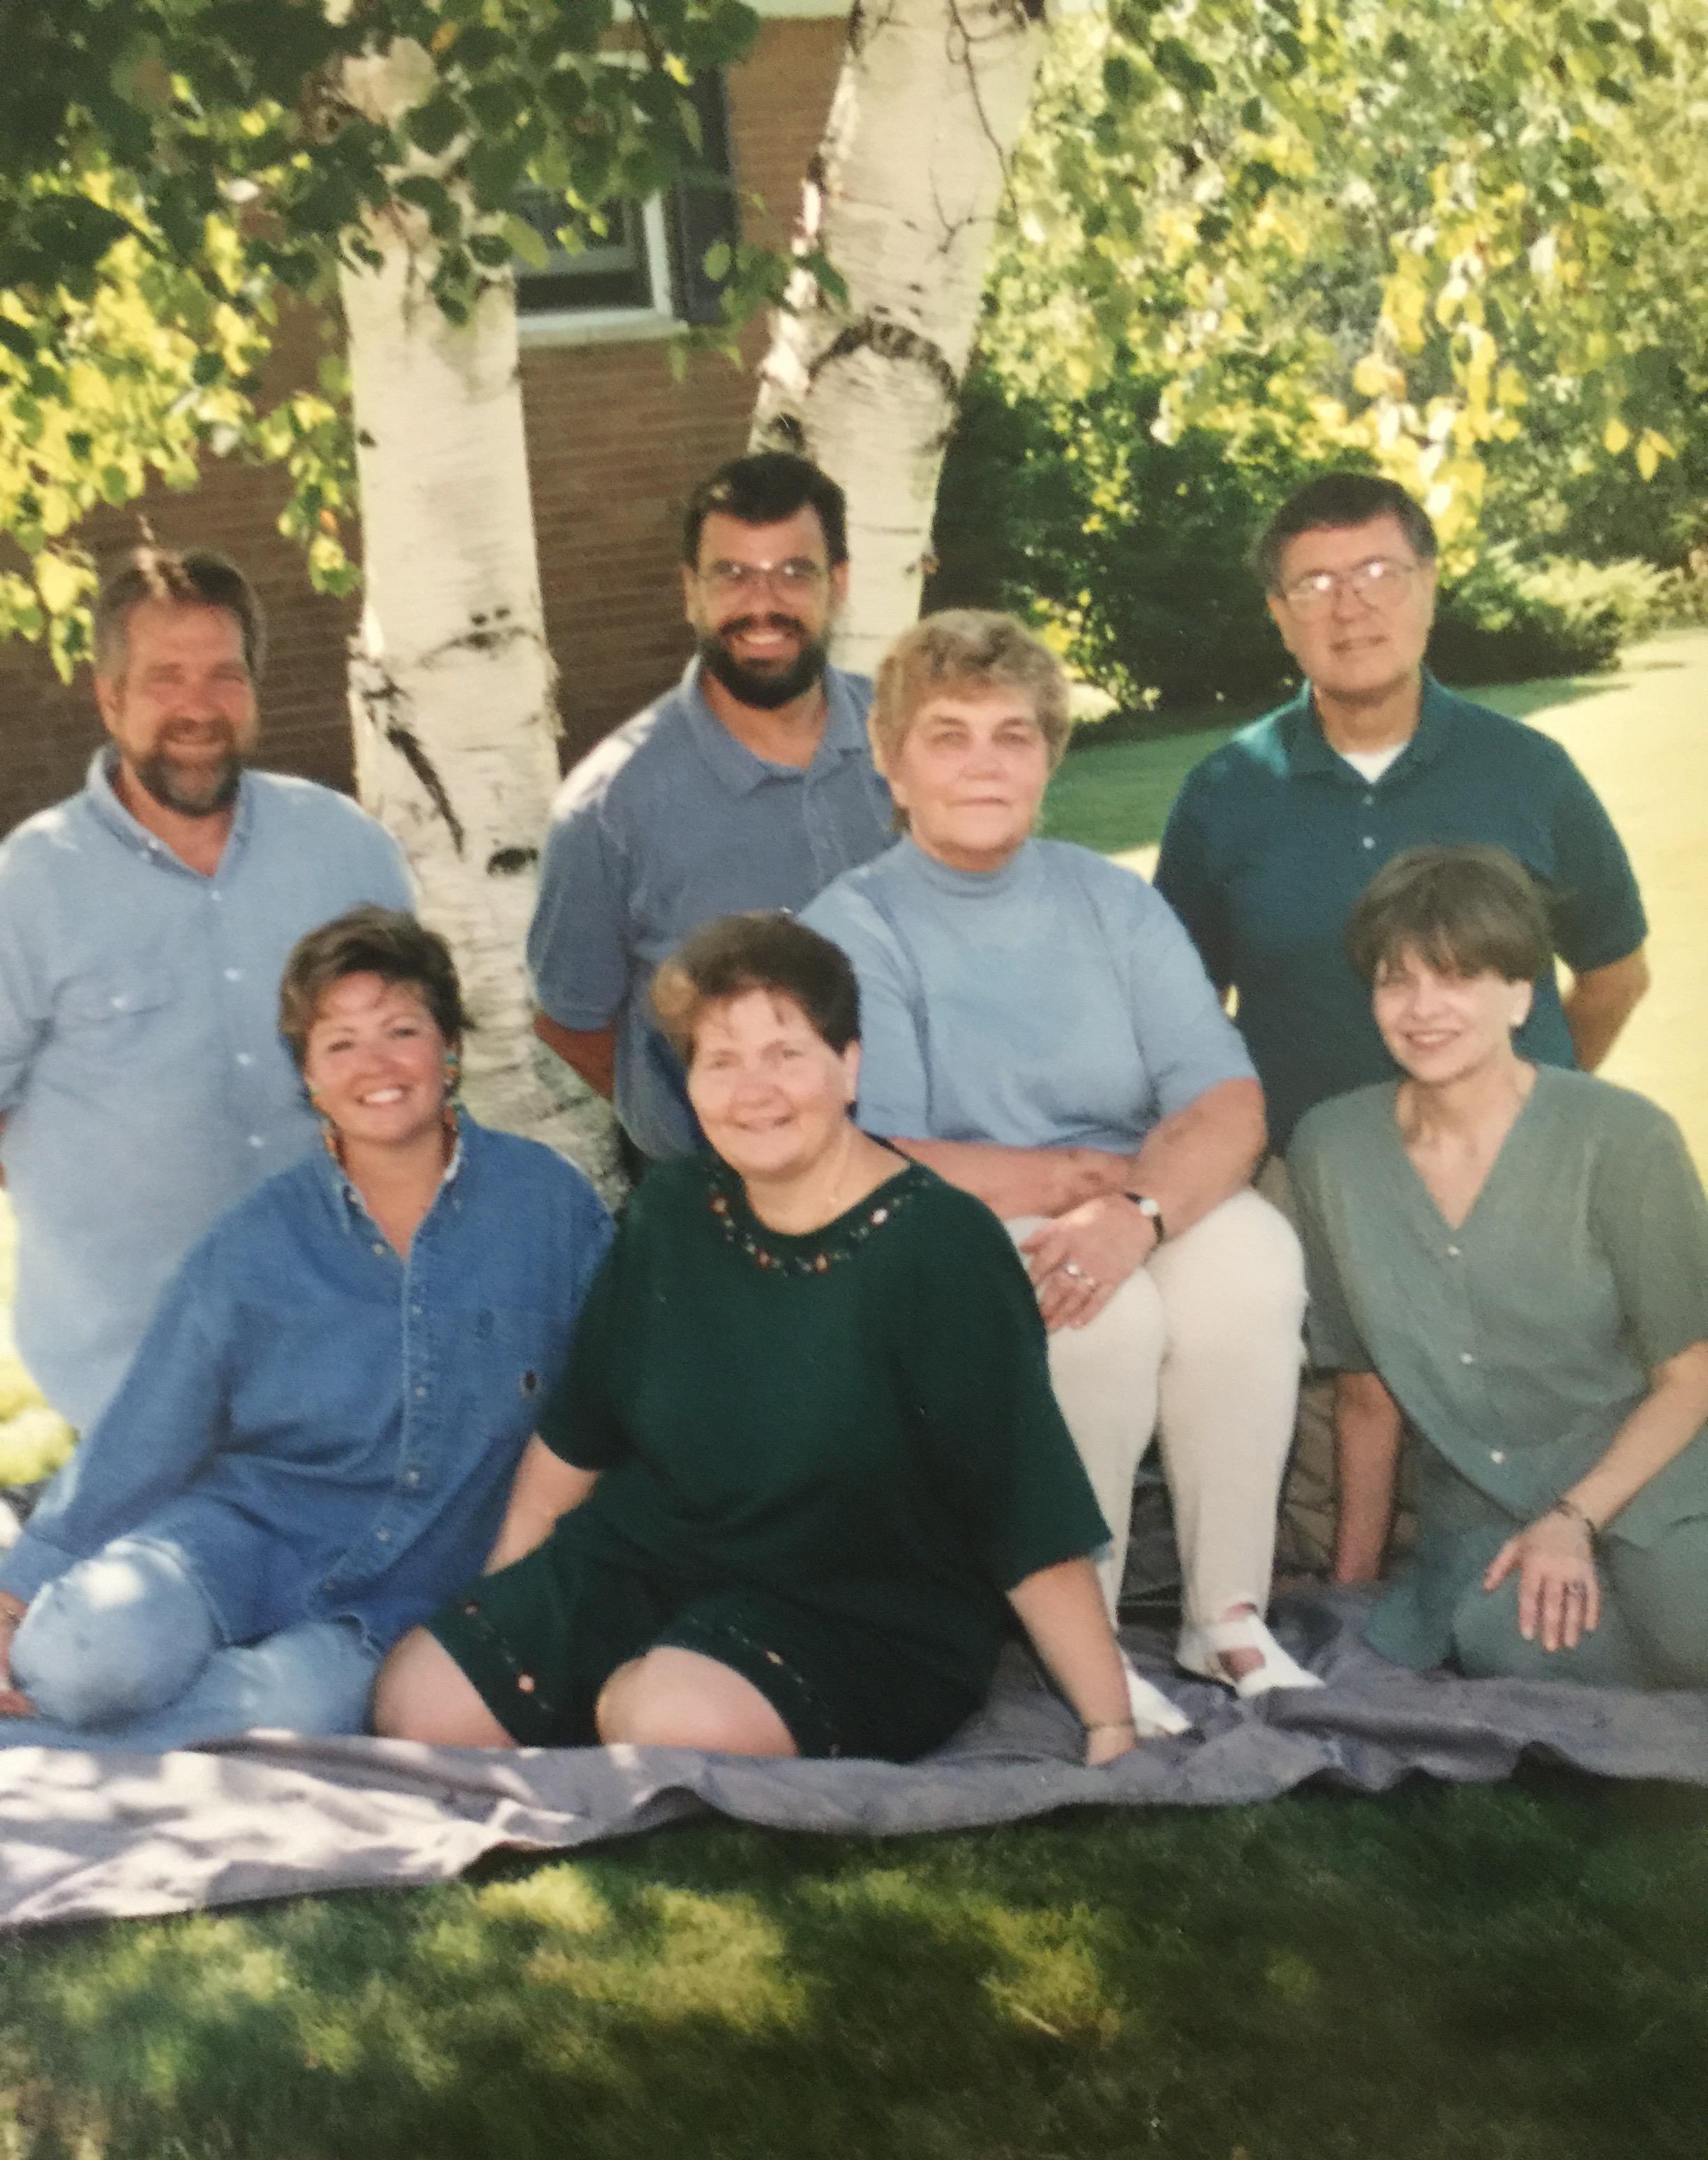 The Bultema family